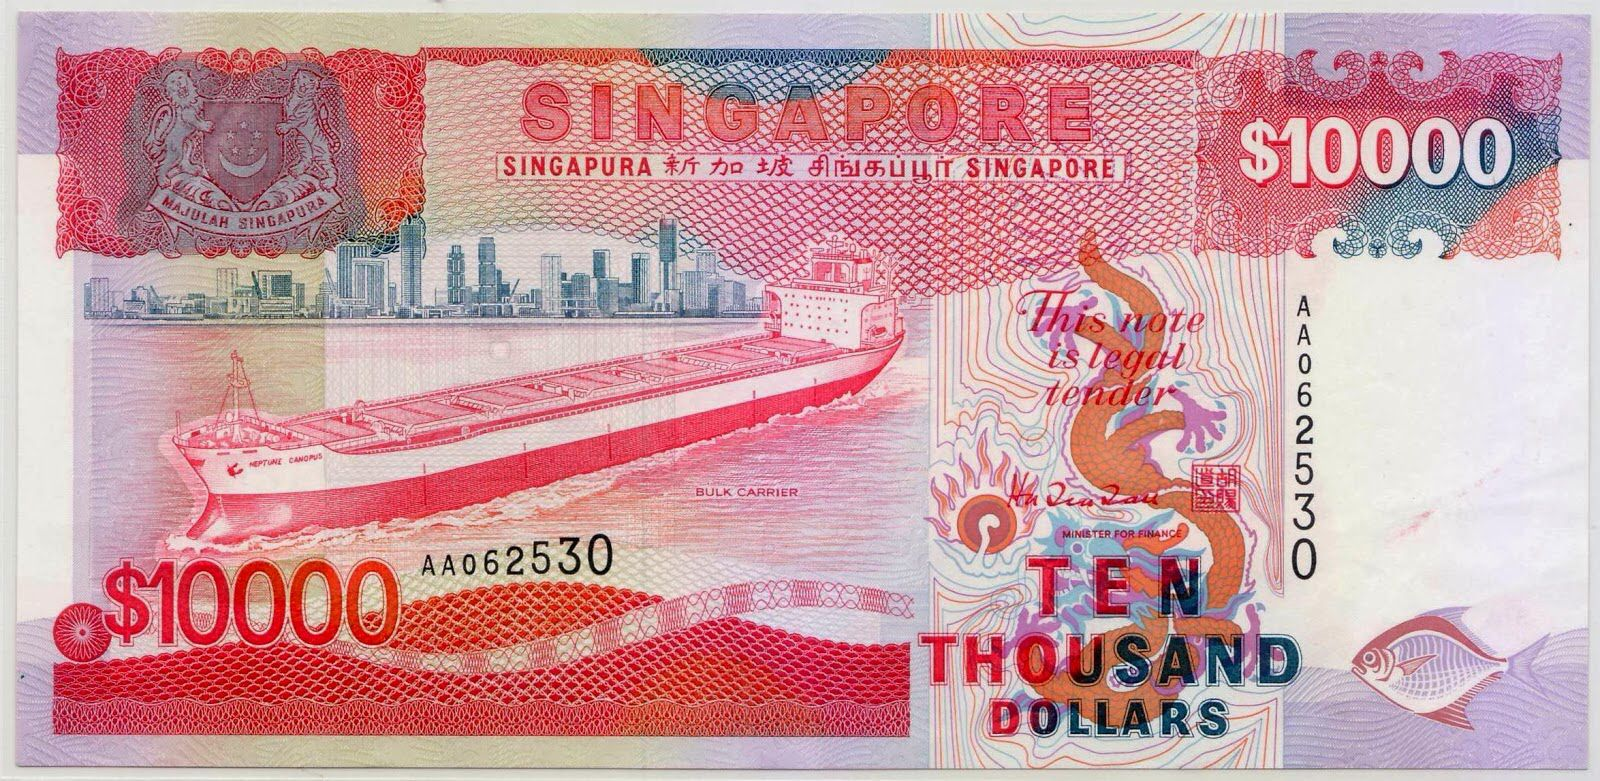 Granelero Neptune Canopus Singapur 10000 Dollars Dollar Note Bank Notes